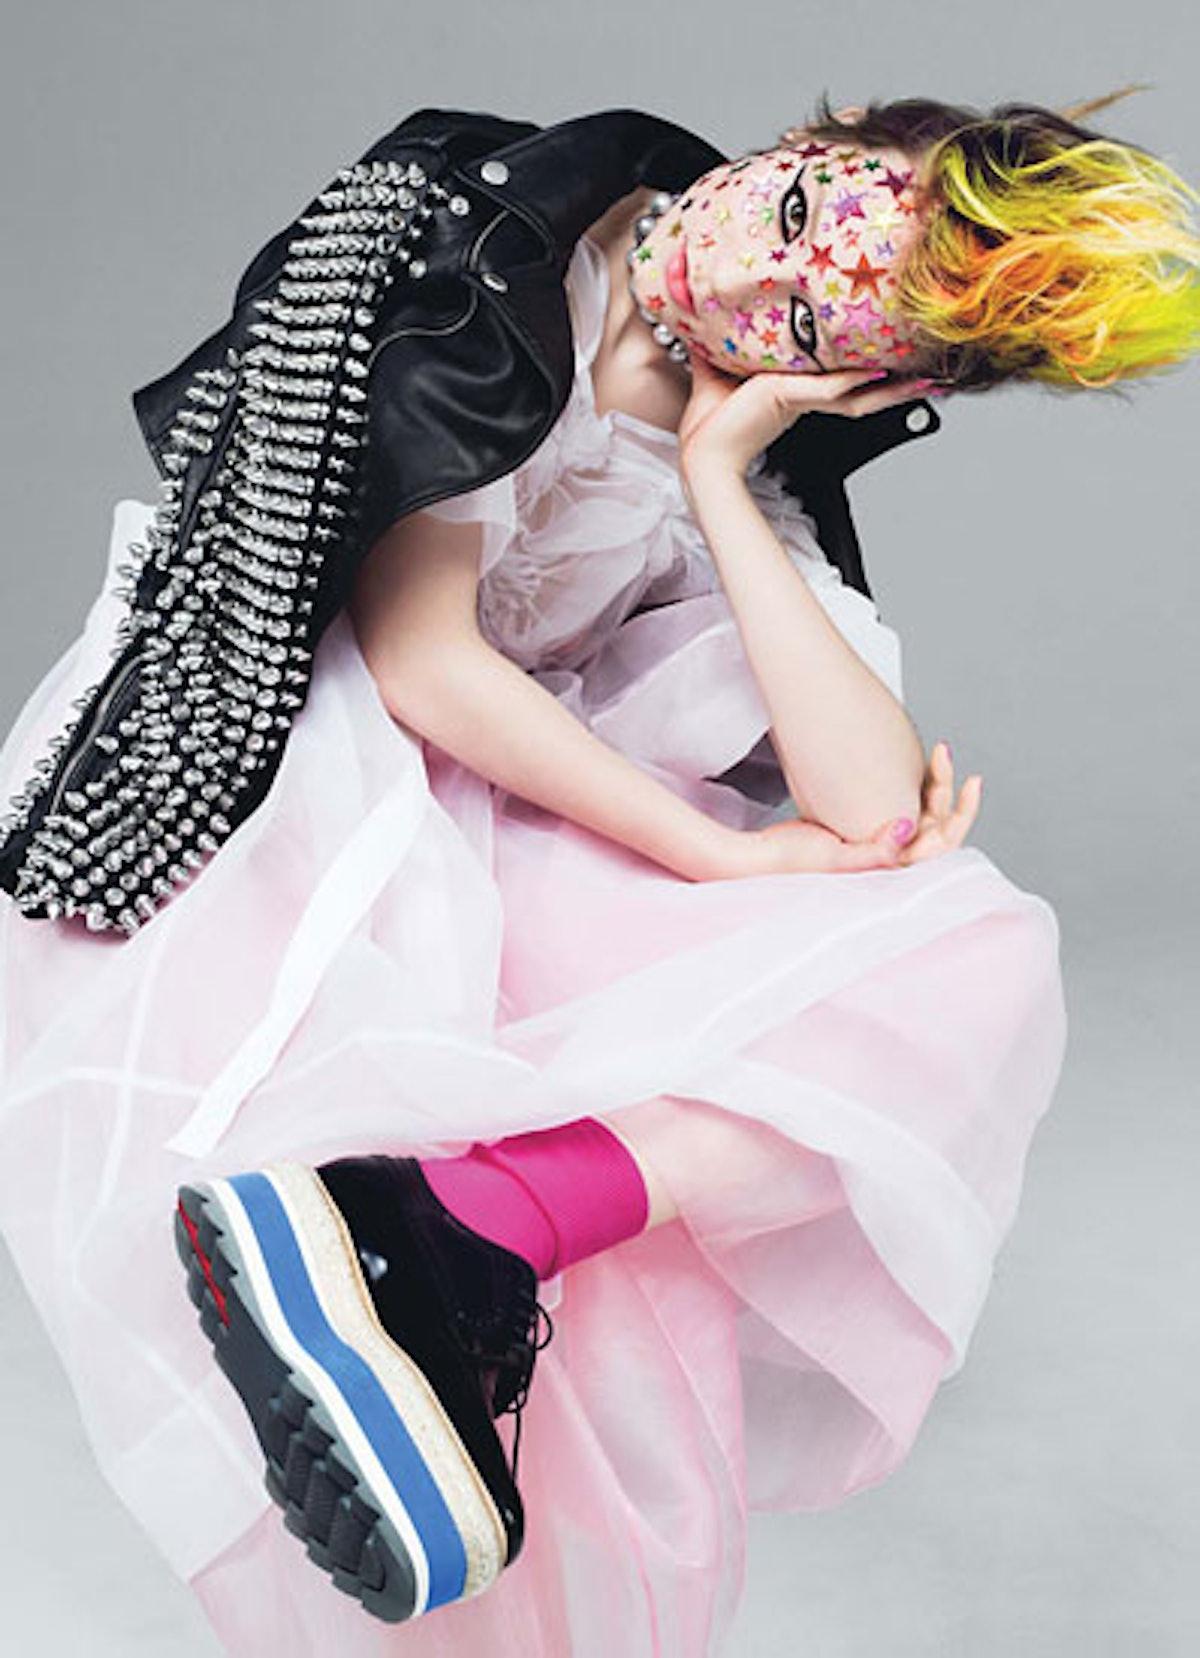 fass-mia-wasikowska-punk-03-v.jpg